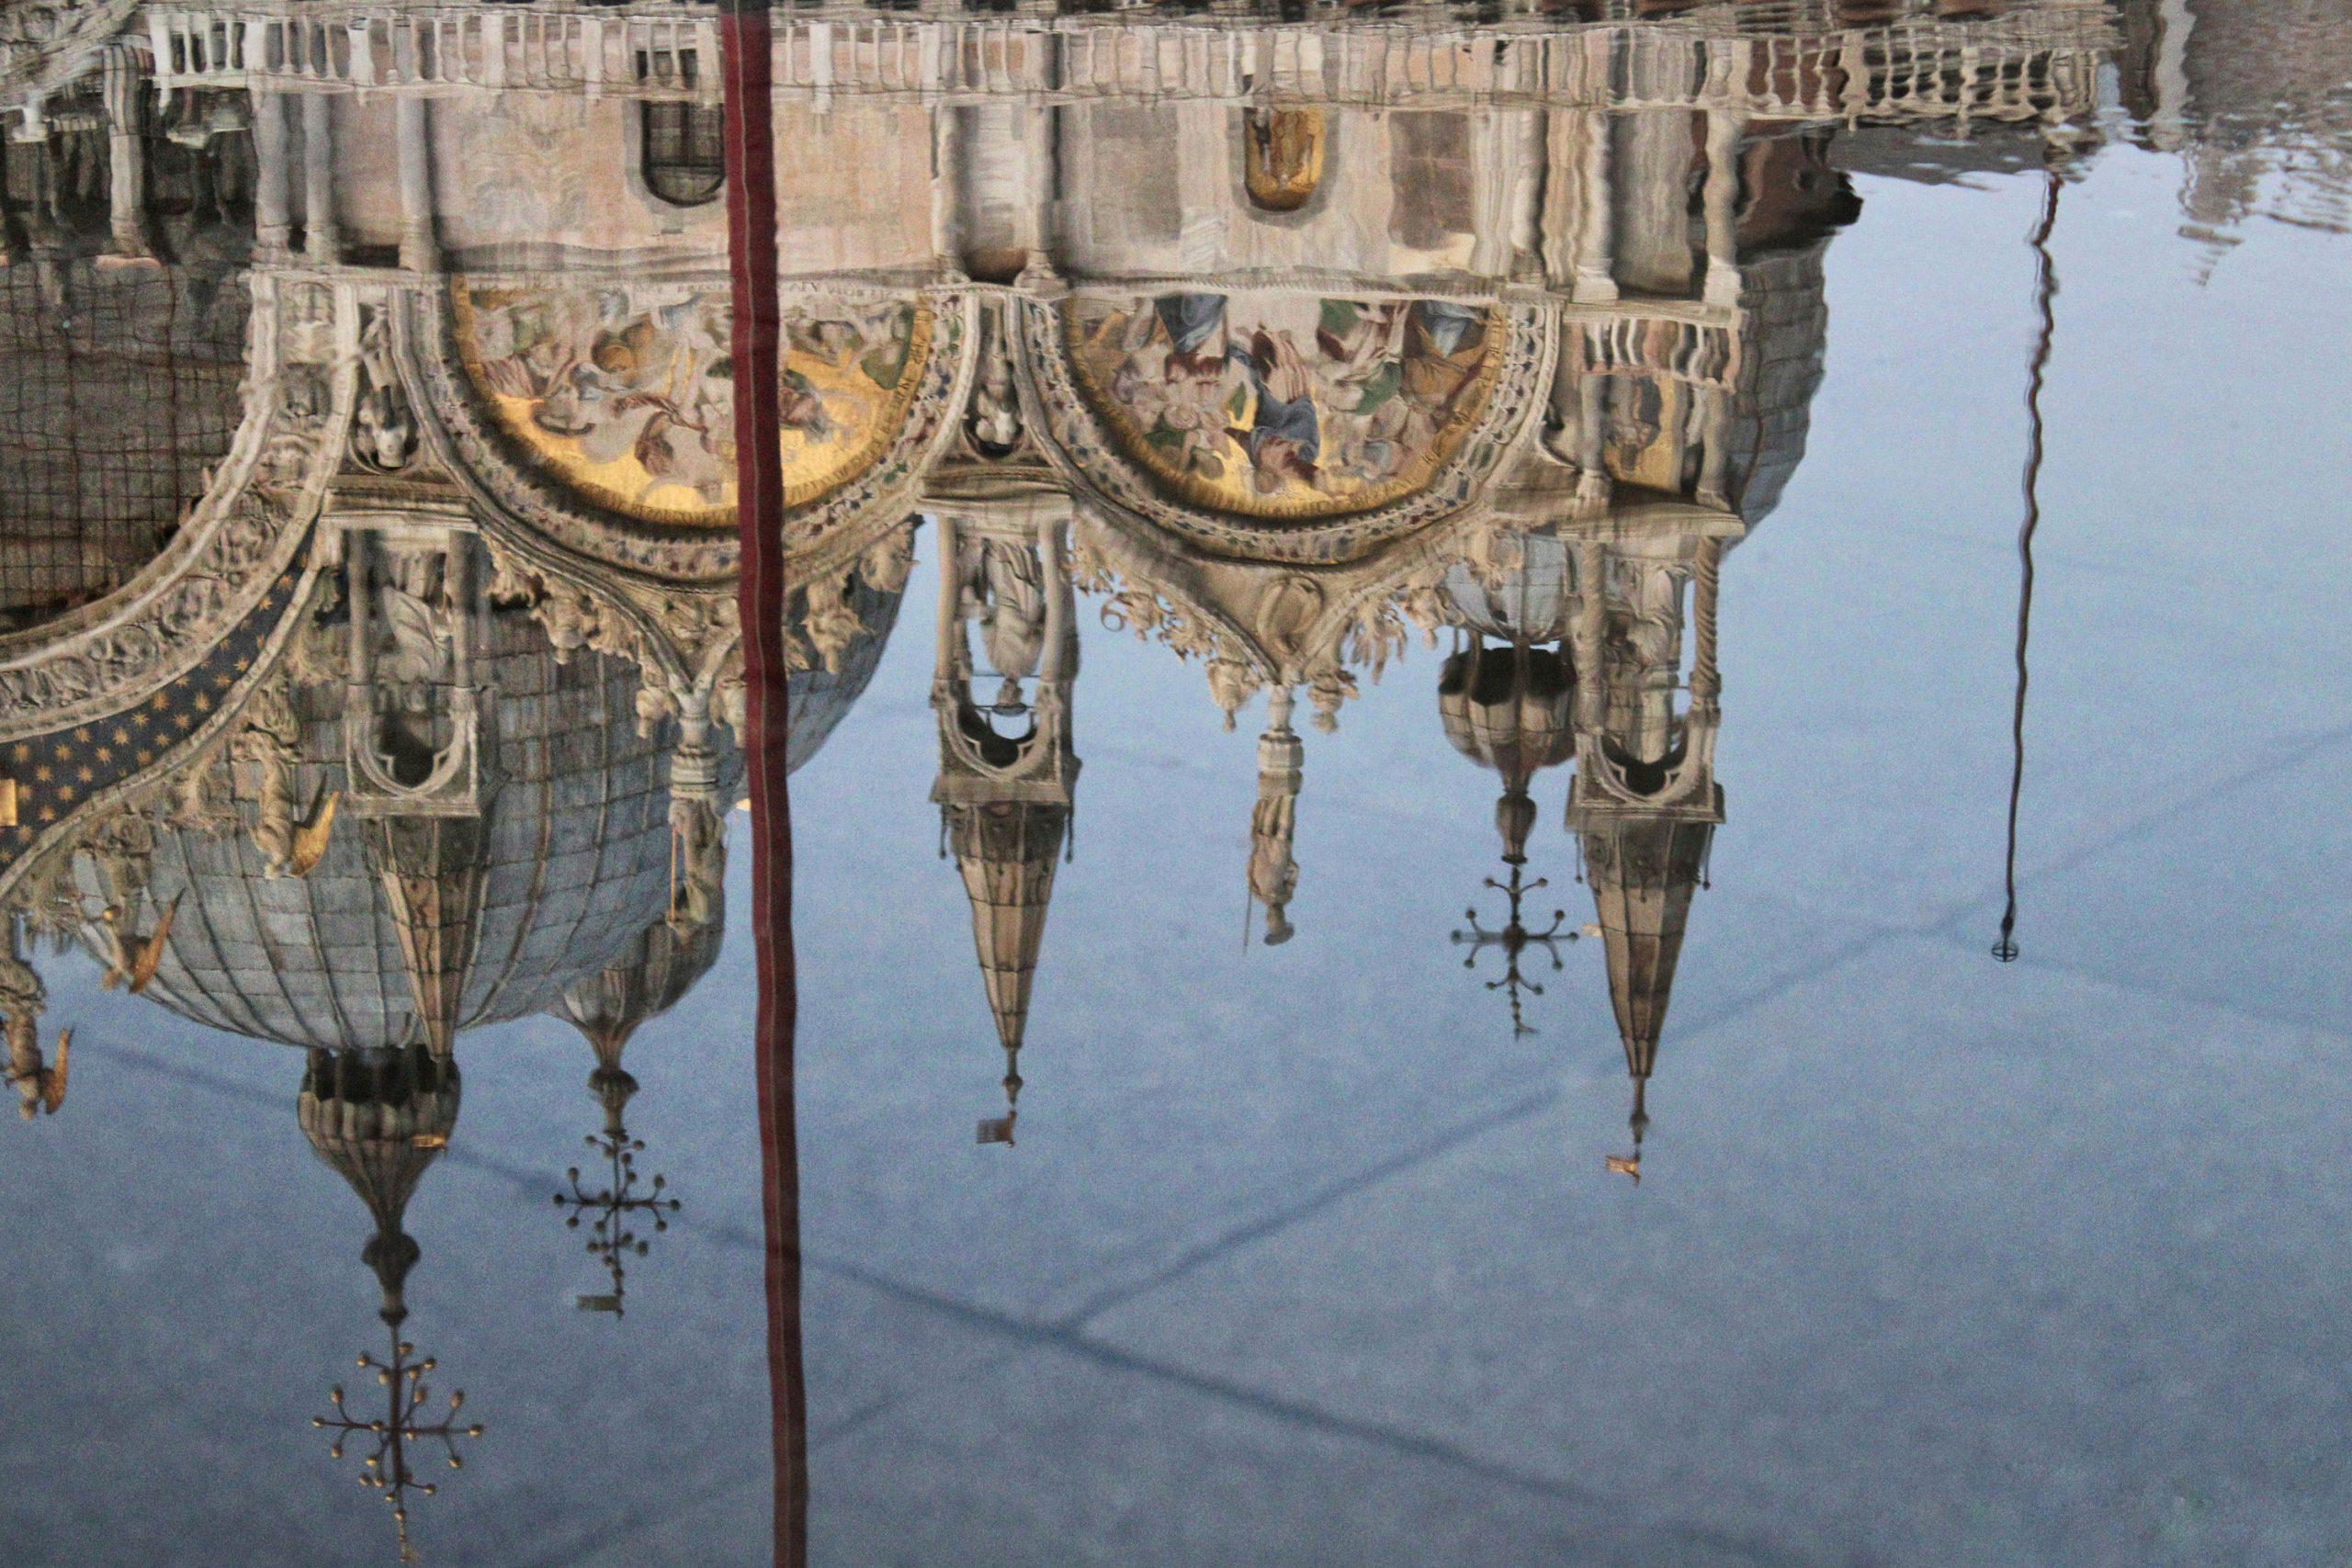 Categorie: Architecture & Interior, Landscape & Nature, Street - Photographer: DANIELA PADOAN - Location: Chioggia, VE, Italia